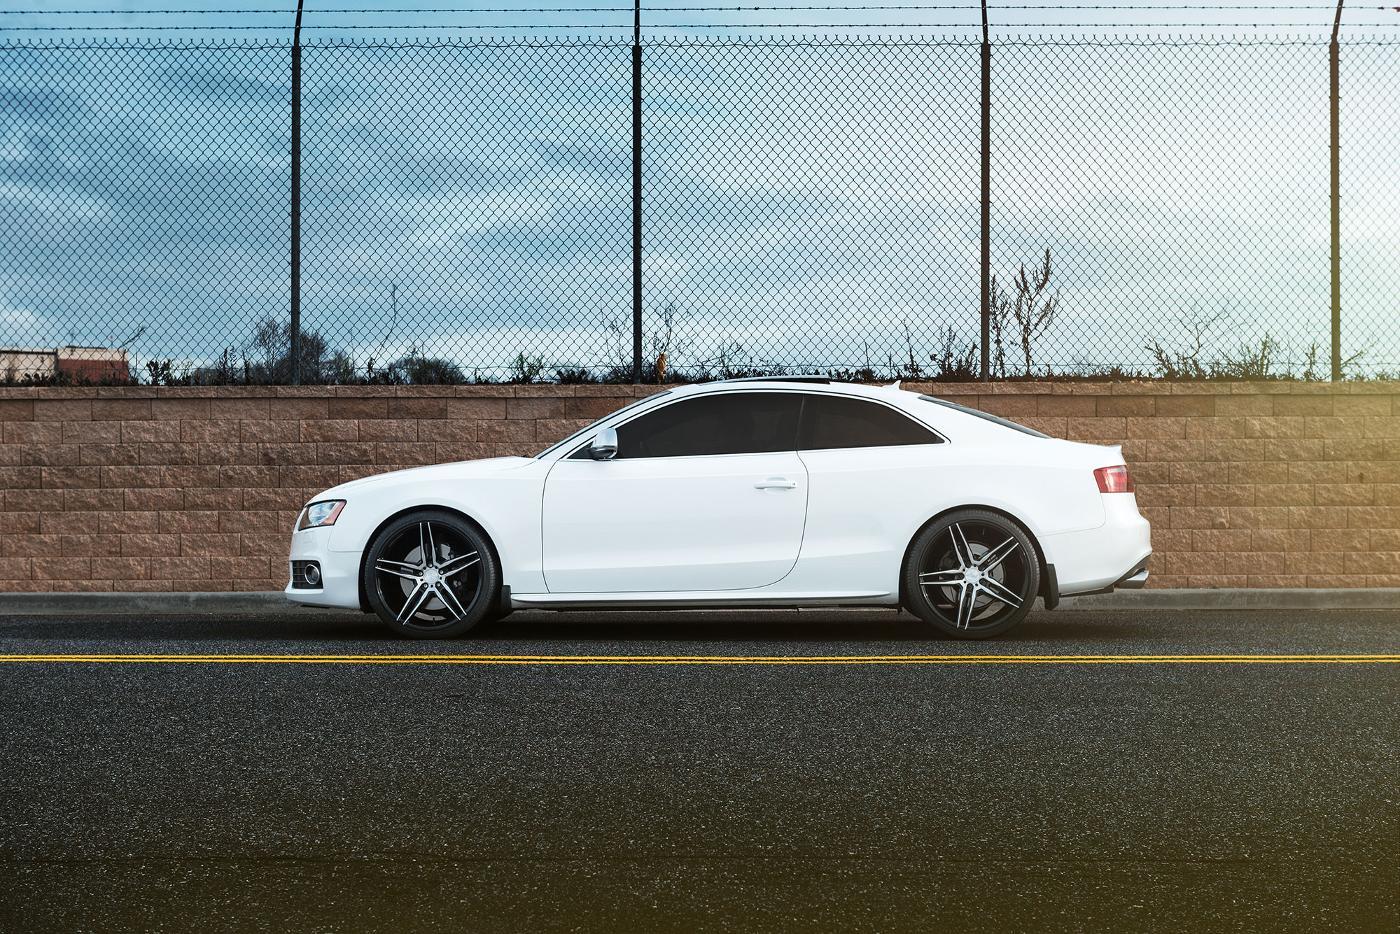 New Niche Turin M169 | Audi S5 - MHT Wheels Inc.